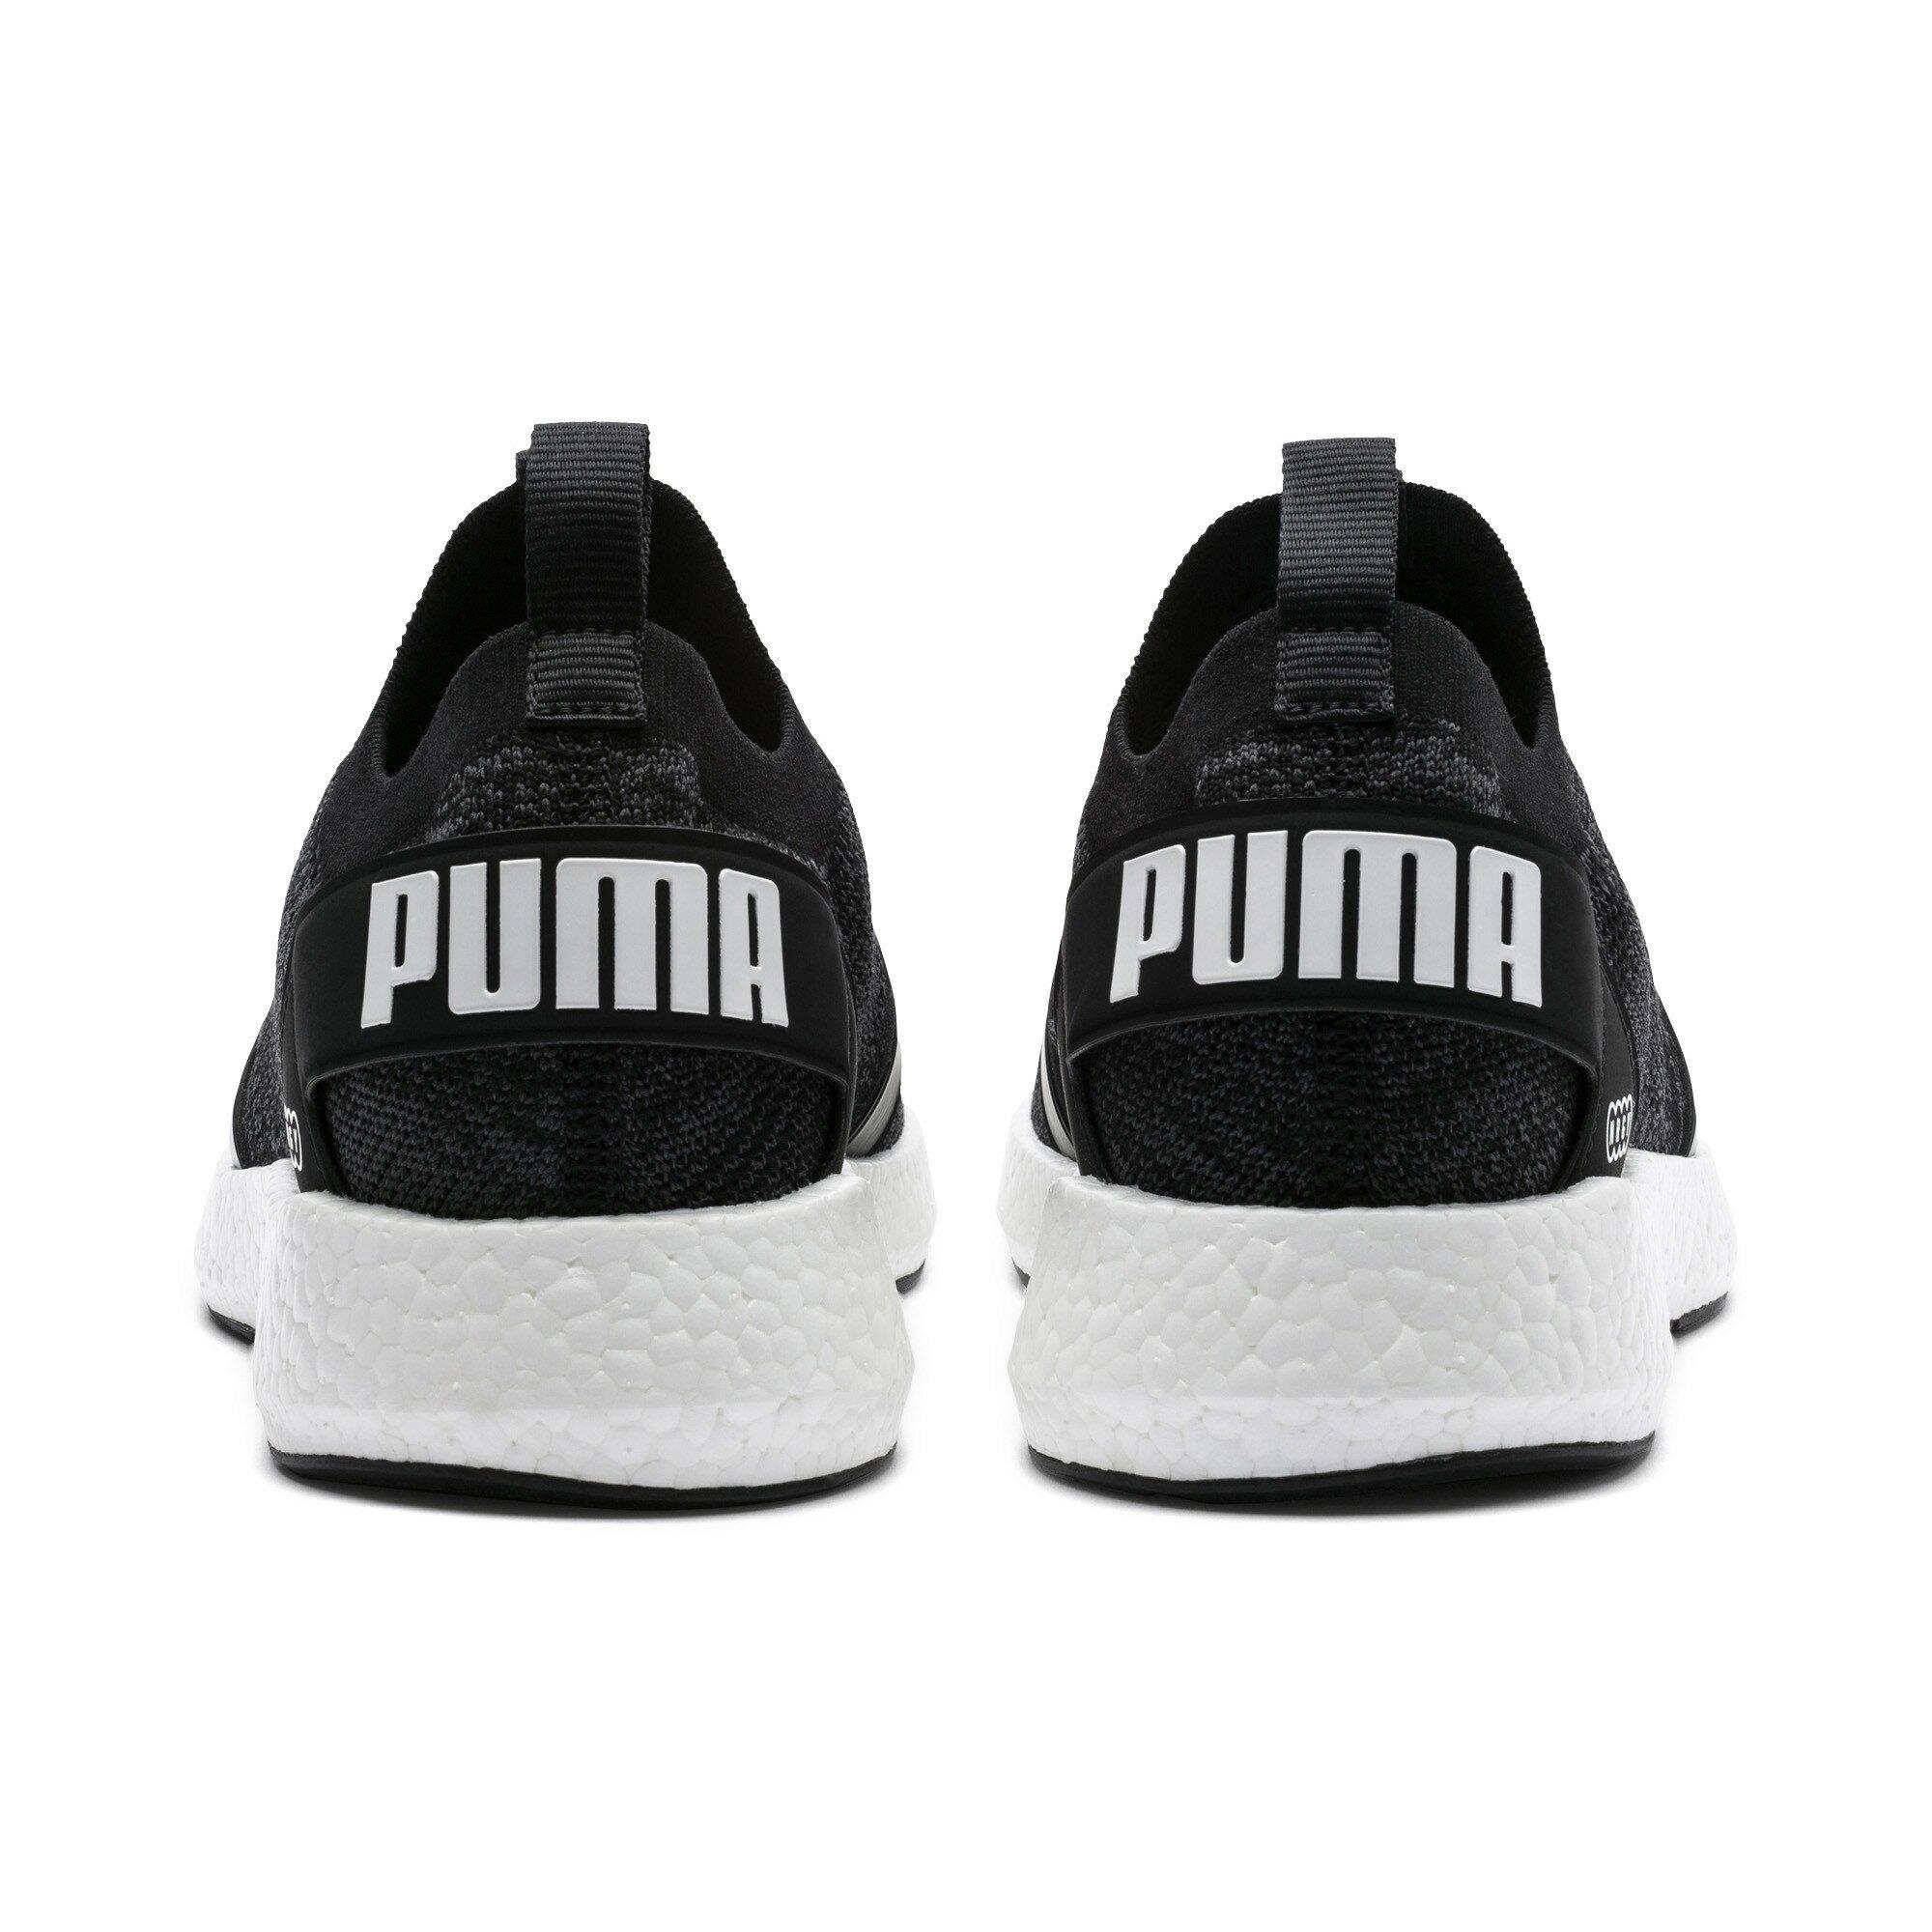 9621b210feec Official Puma Store  PUMA NRGY Neko Engineer Knit Men s Running ...